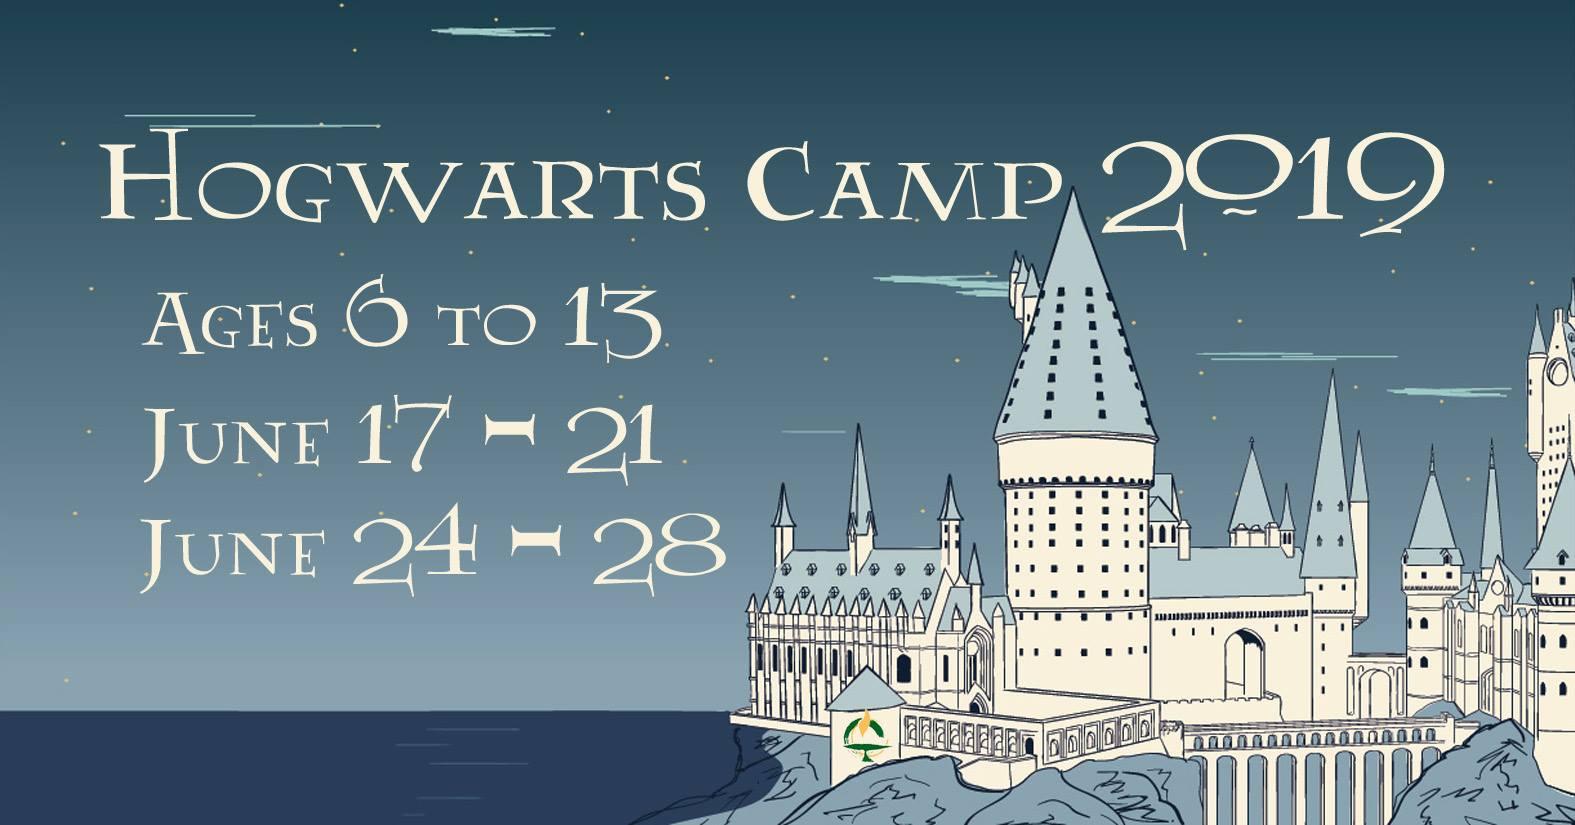 Hogwarts Camp 2019